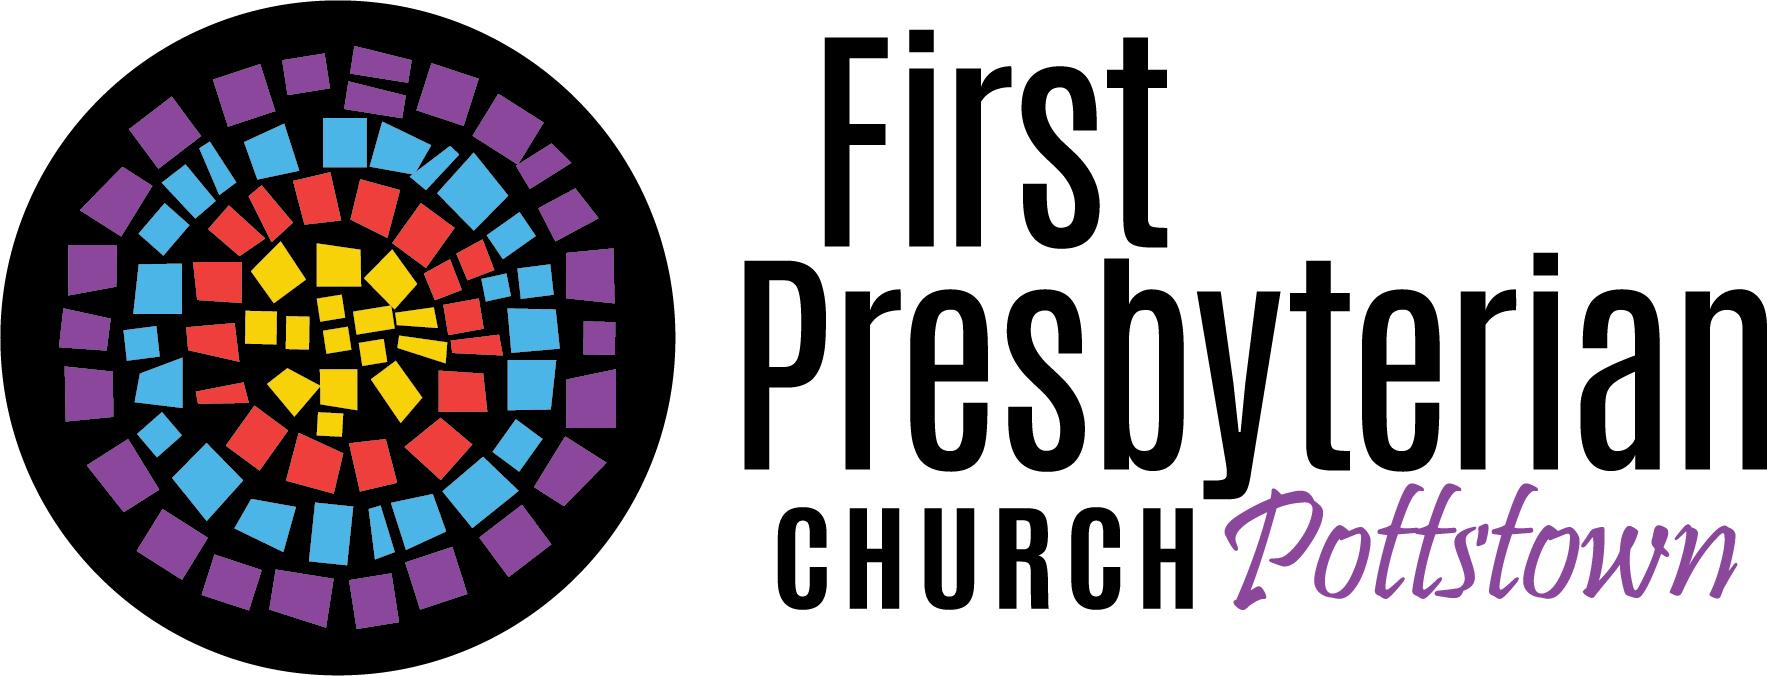 First Presbyterian Church Pottstown